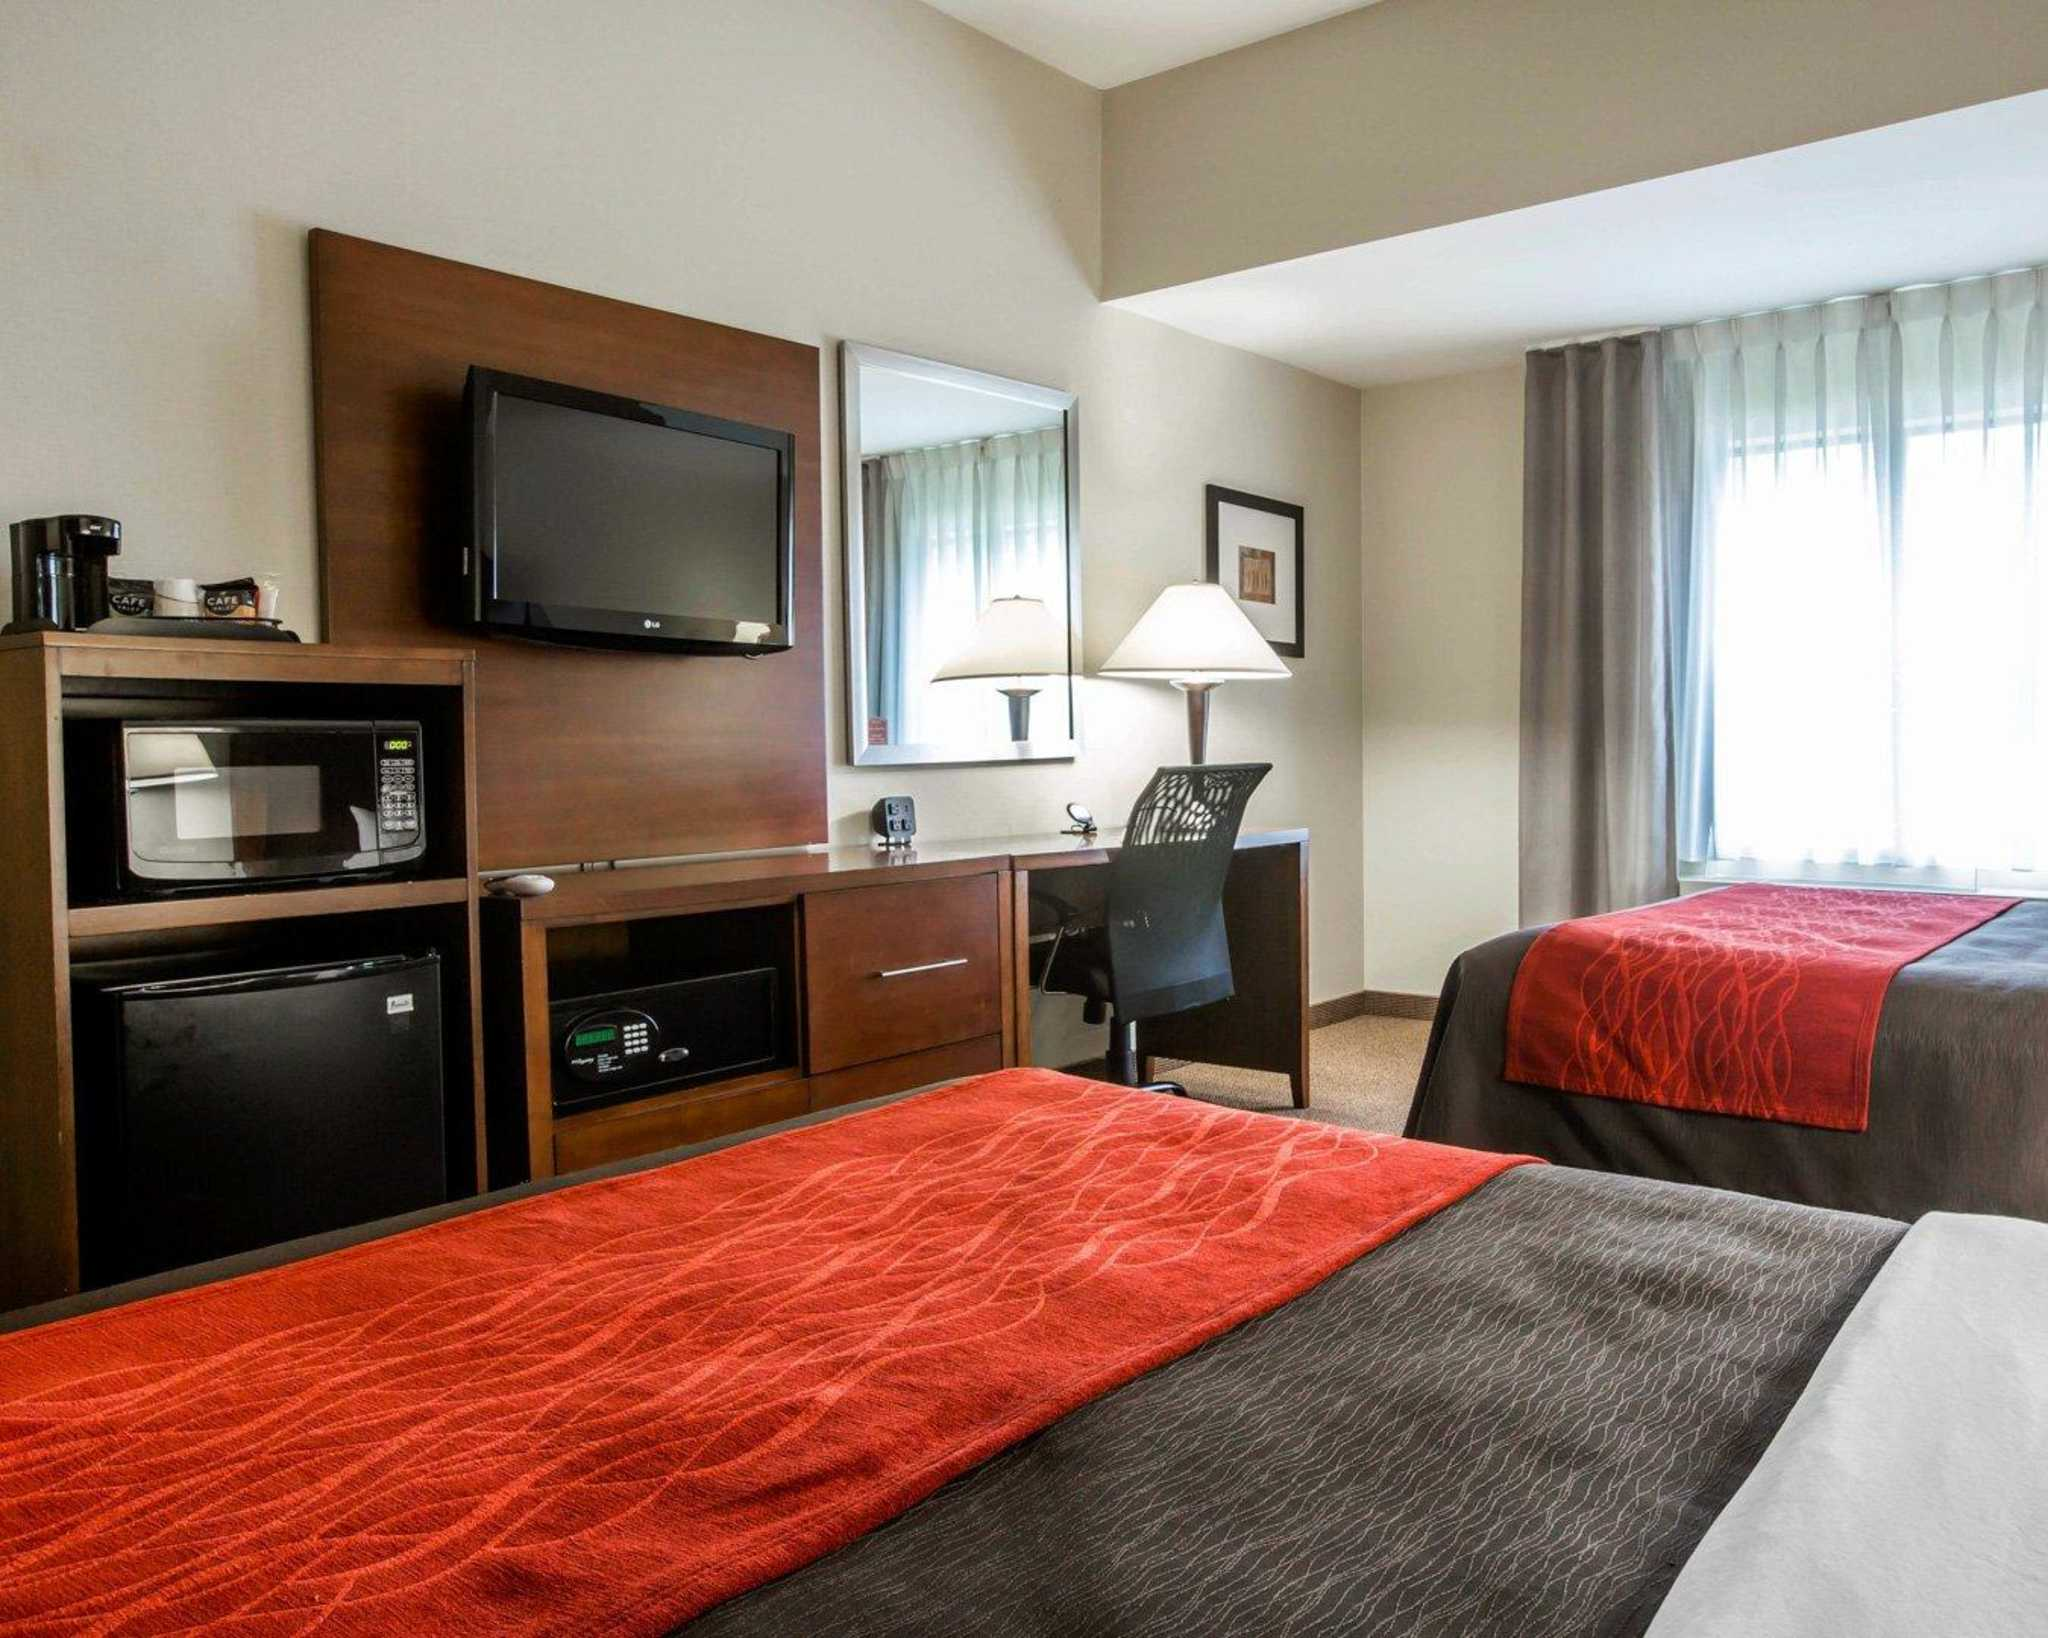 Comfort Inn & Suites adj to Akwesasne Mohawk Casino image 5